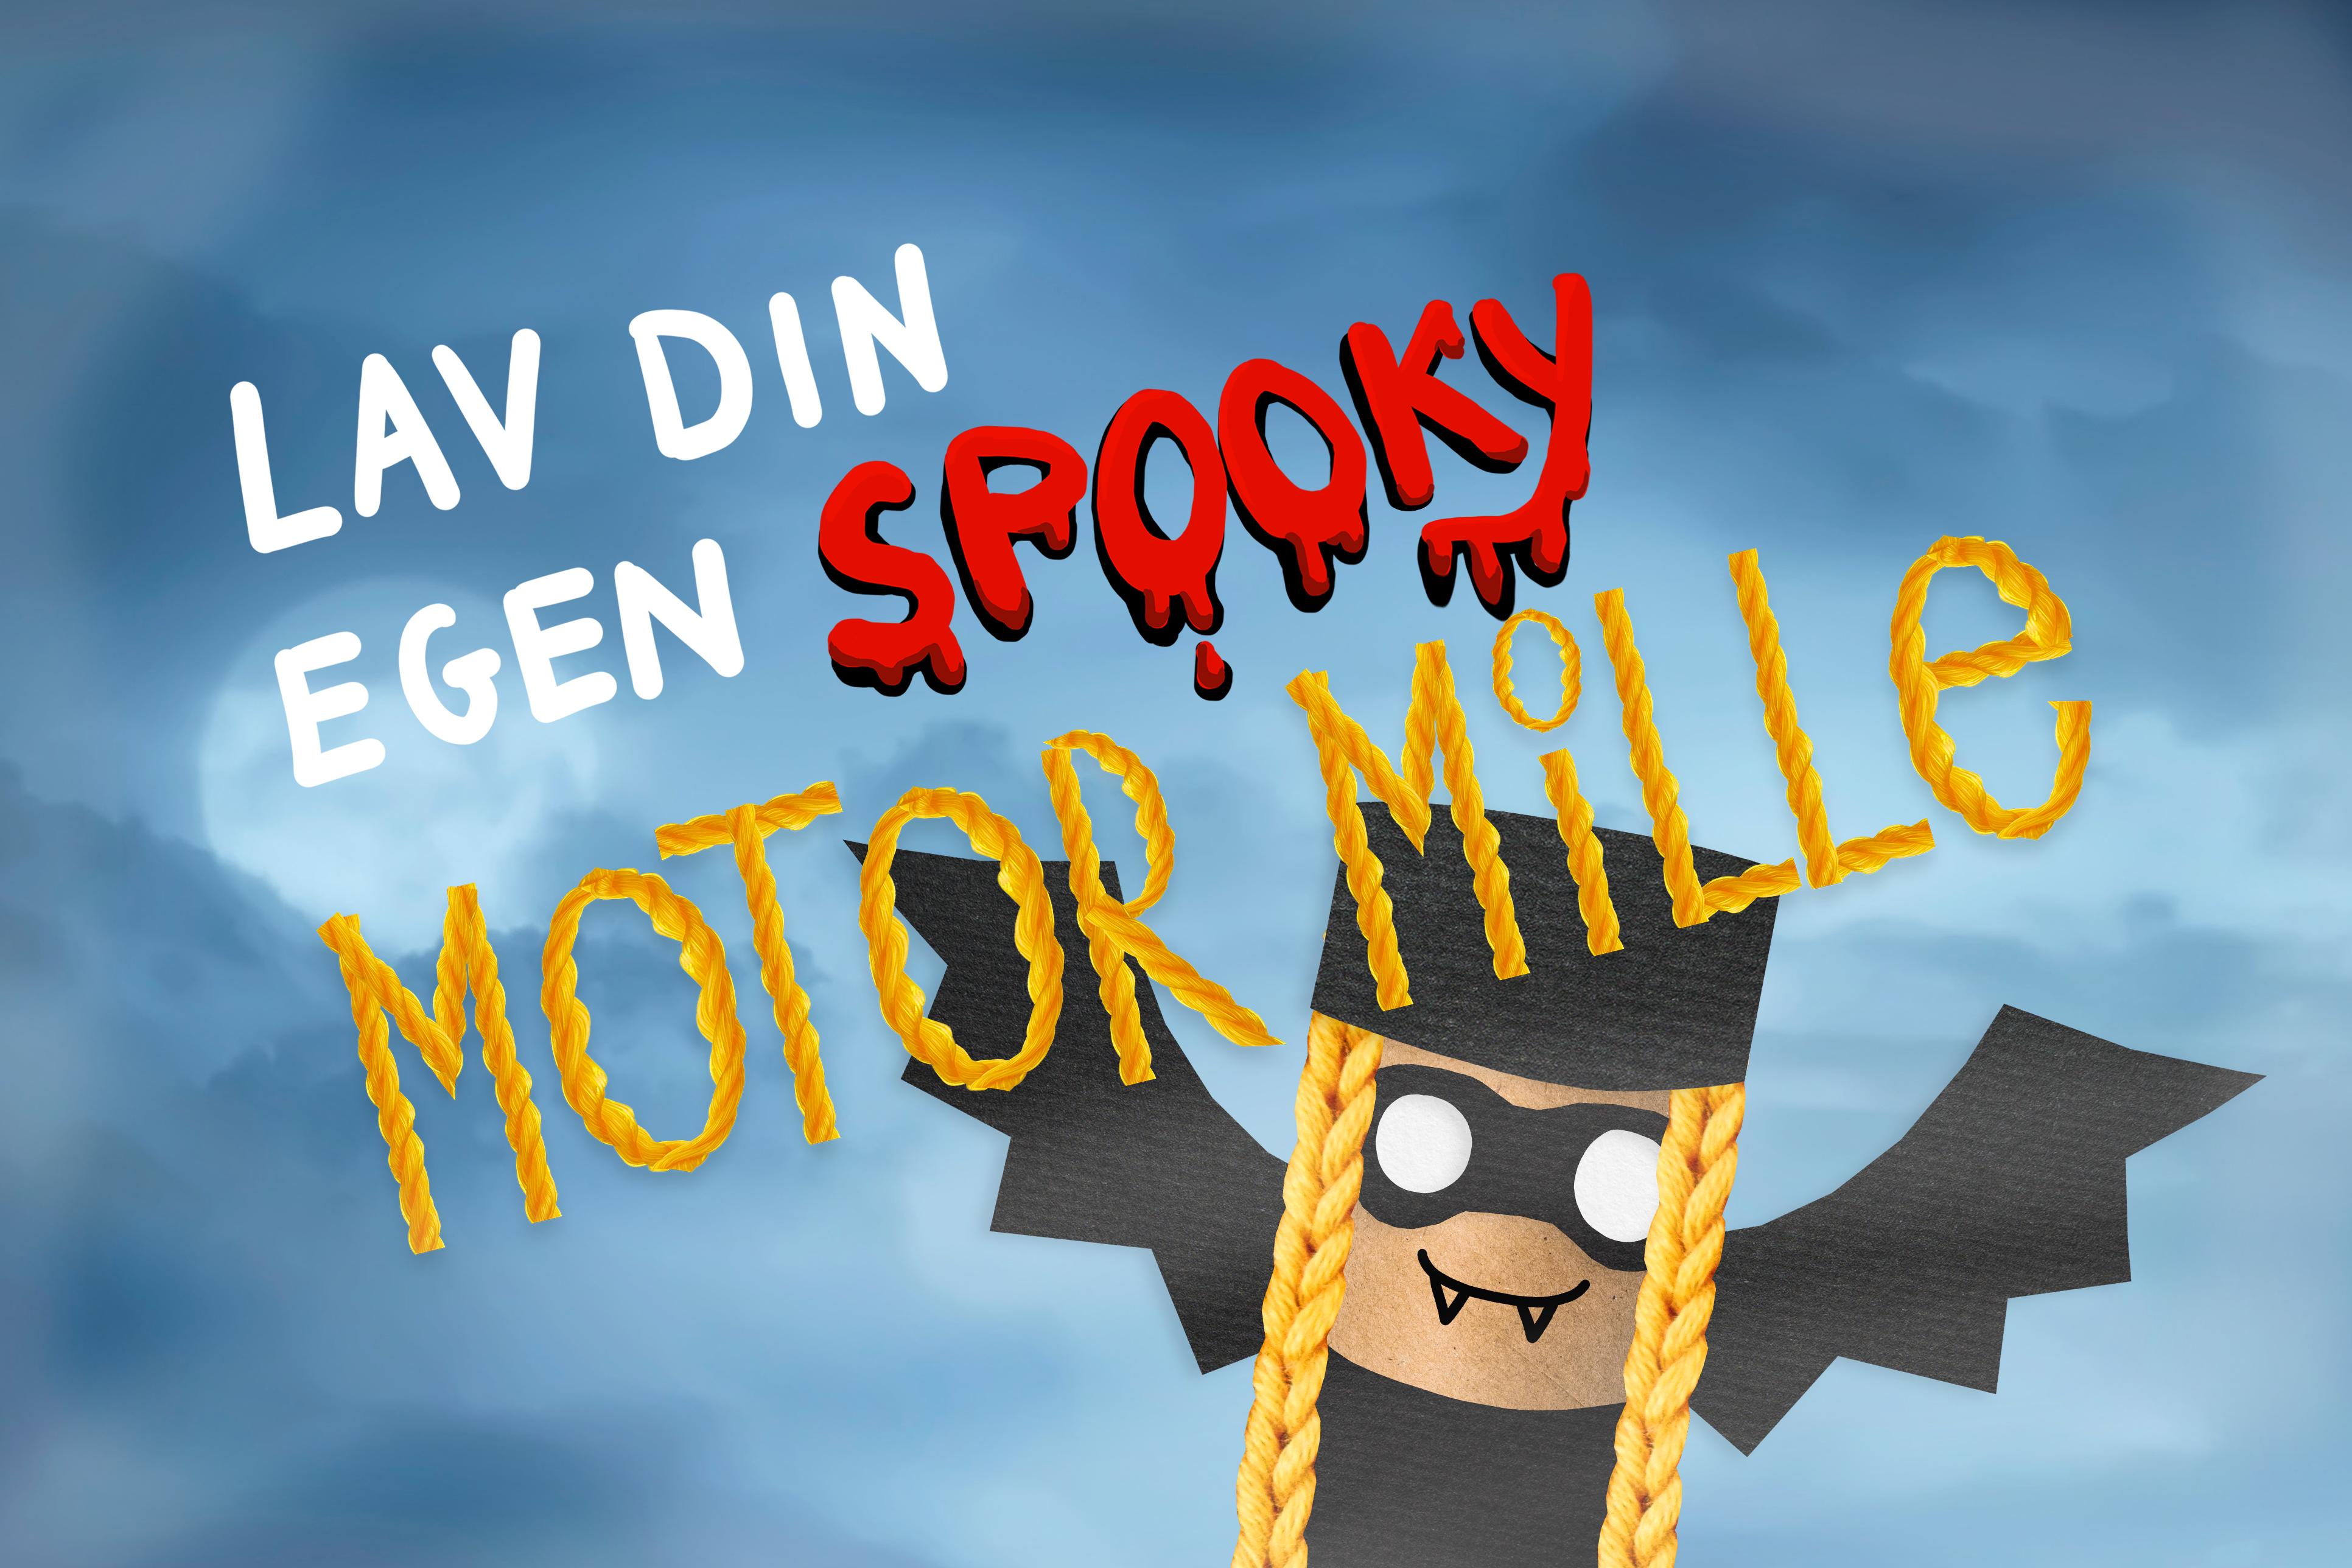 Lav din egen spooky Motor Mille!